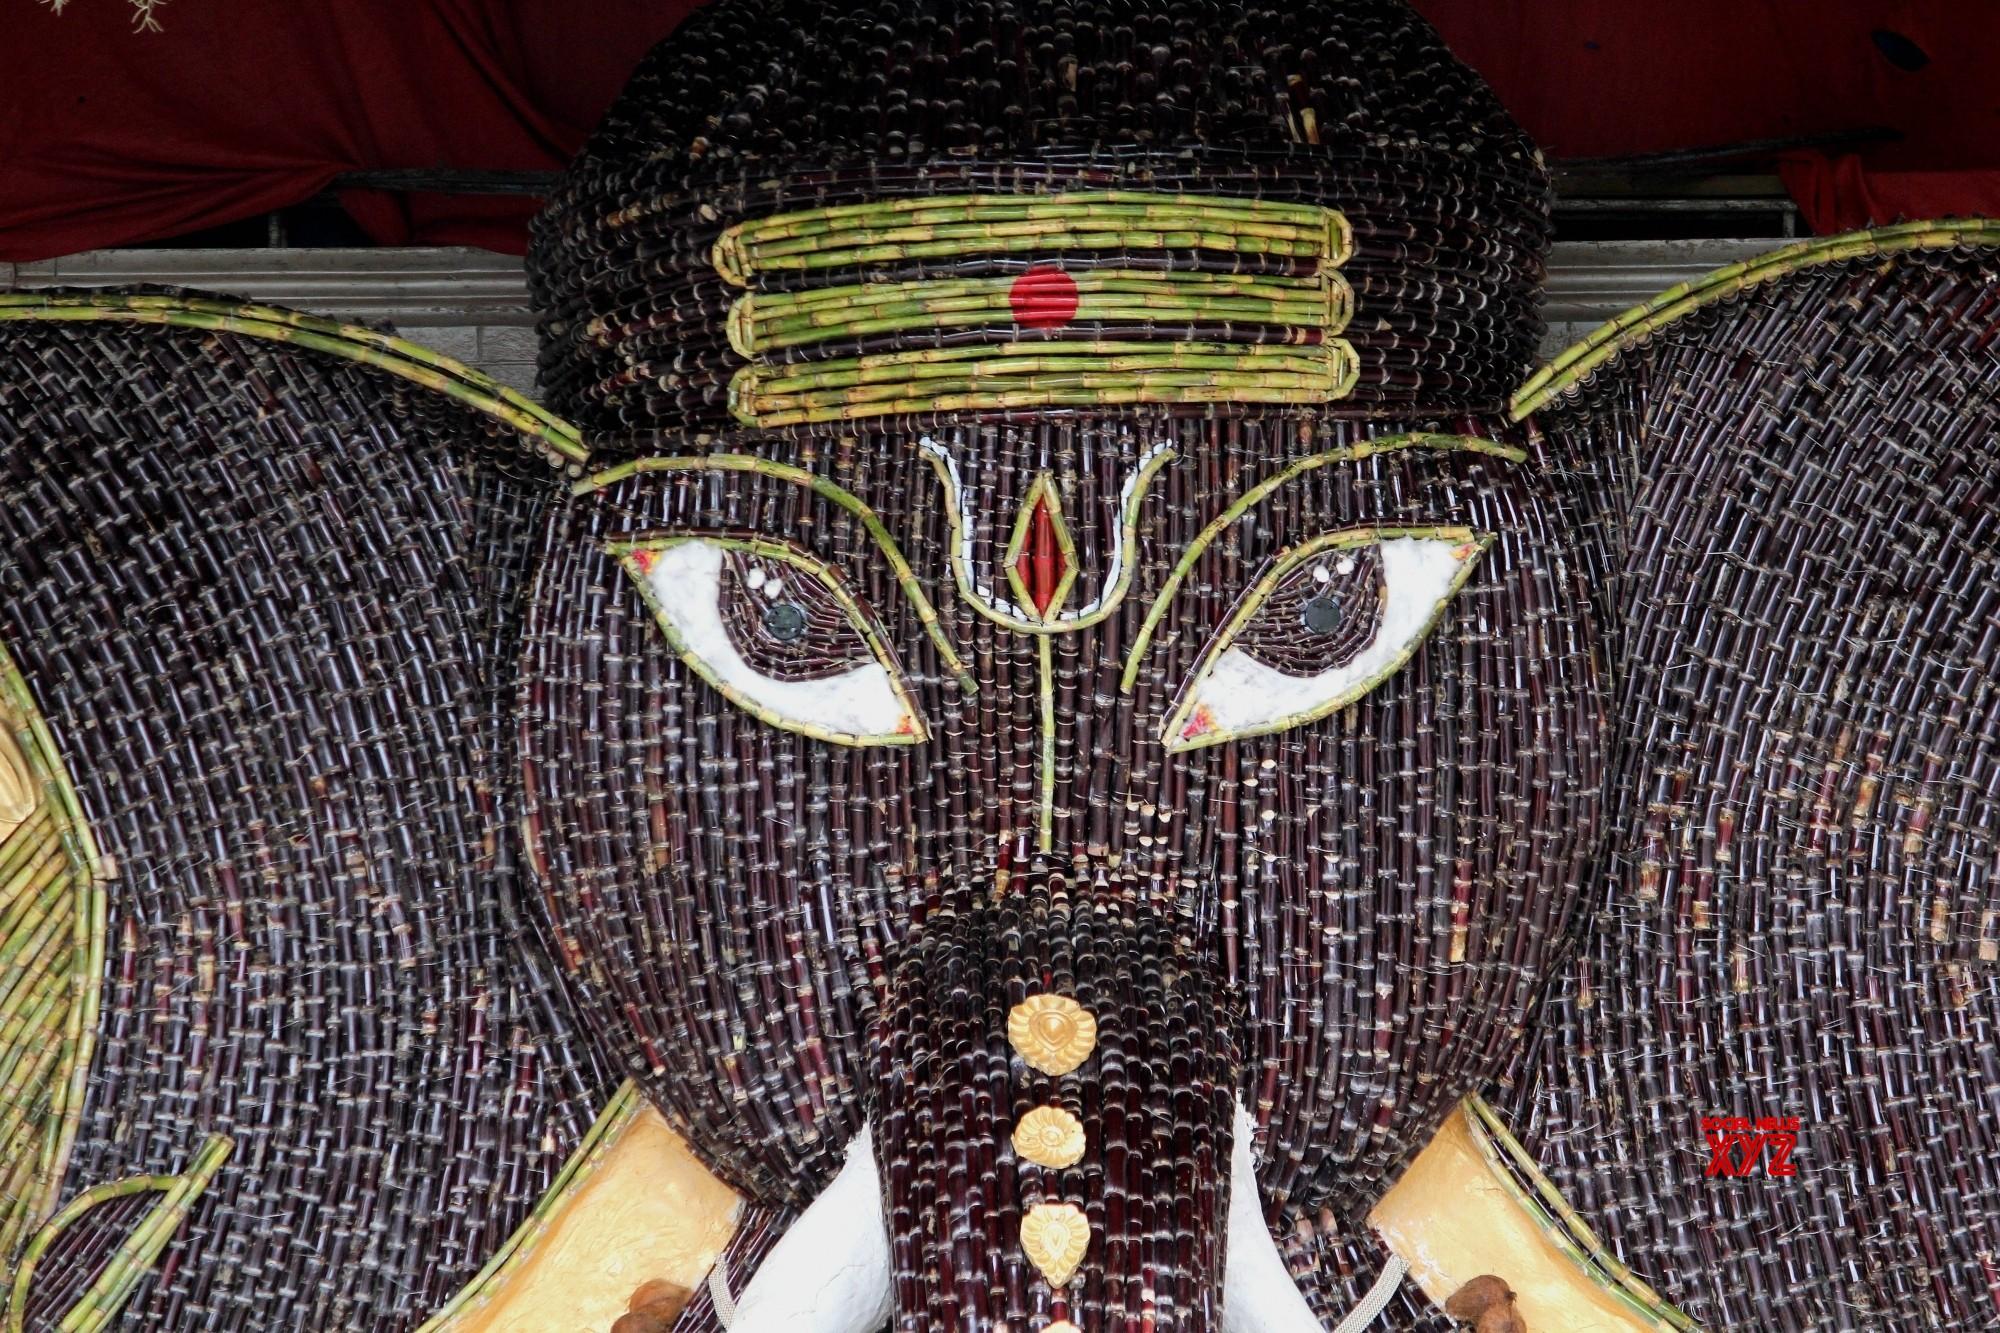 Bengaluru devotees decorated Lord Ganesha with sugarcane